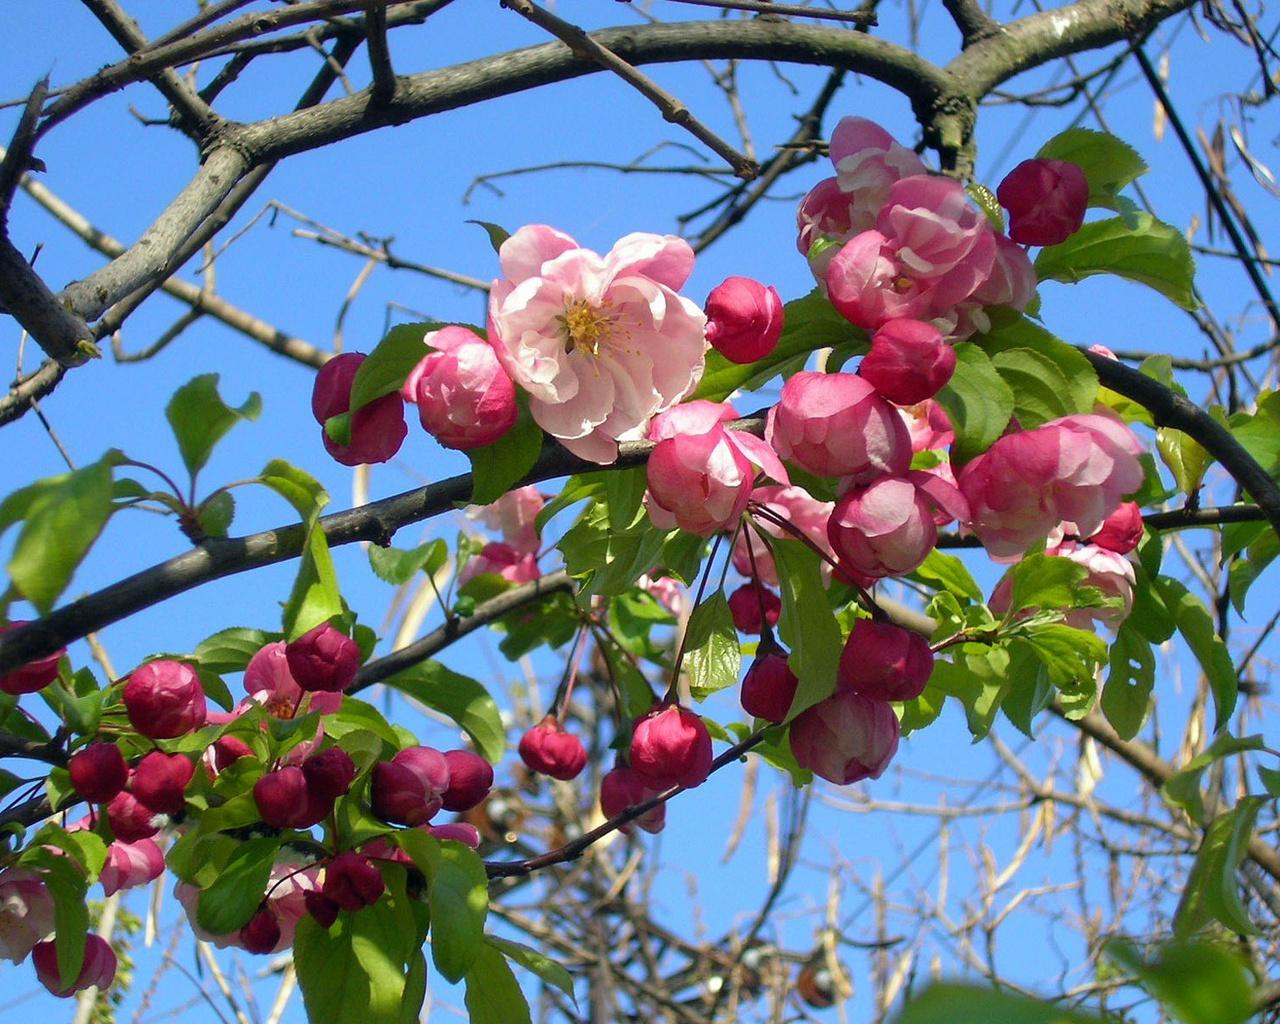 Весна обои на рабочий стол 1280x1024 №798508